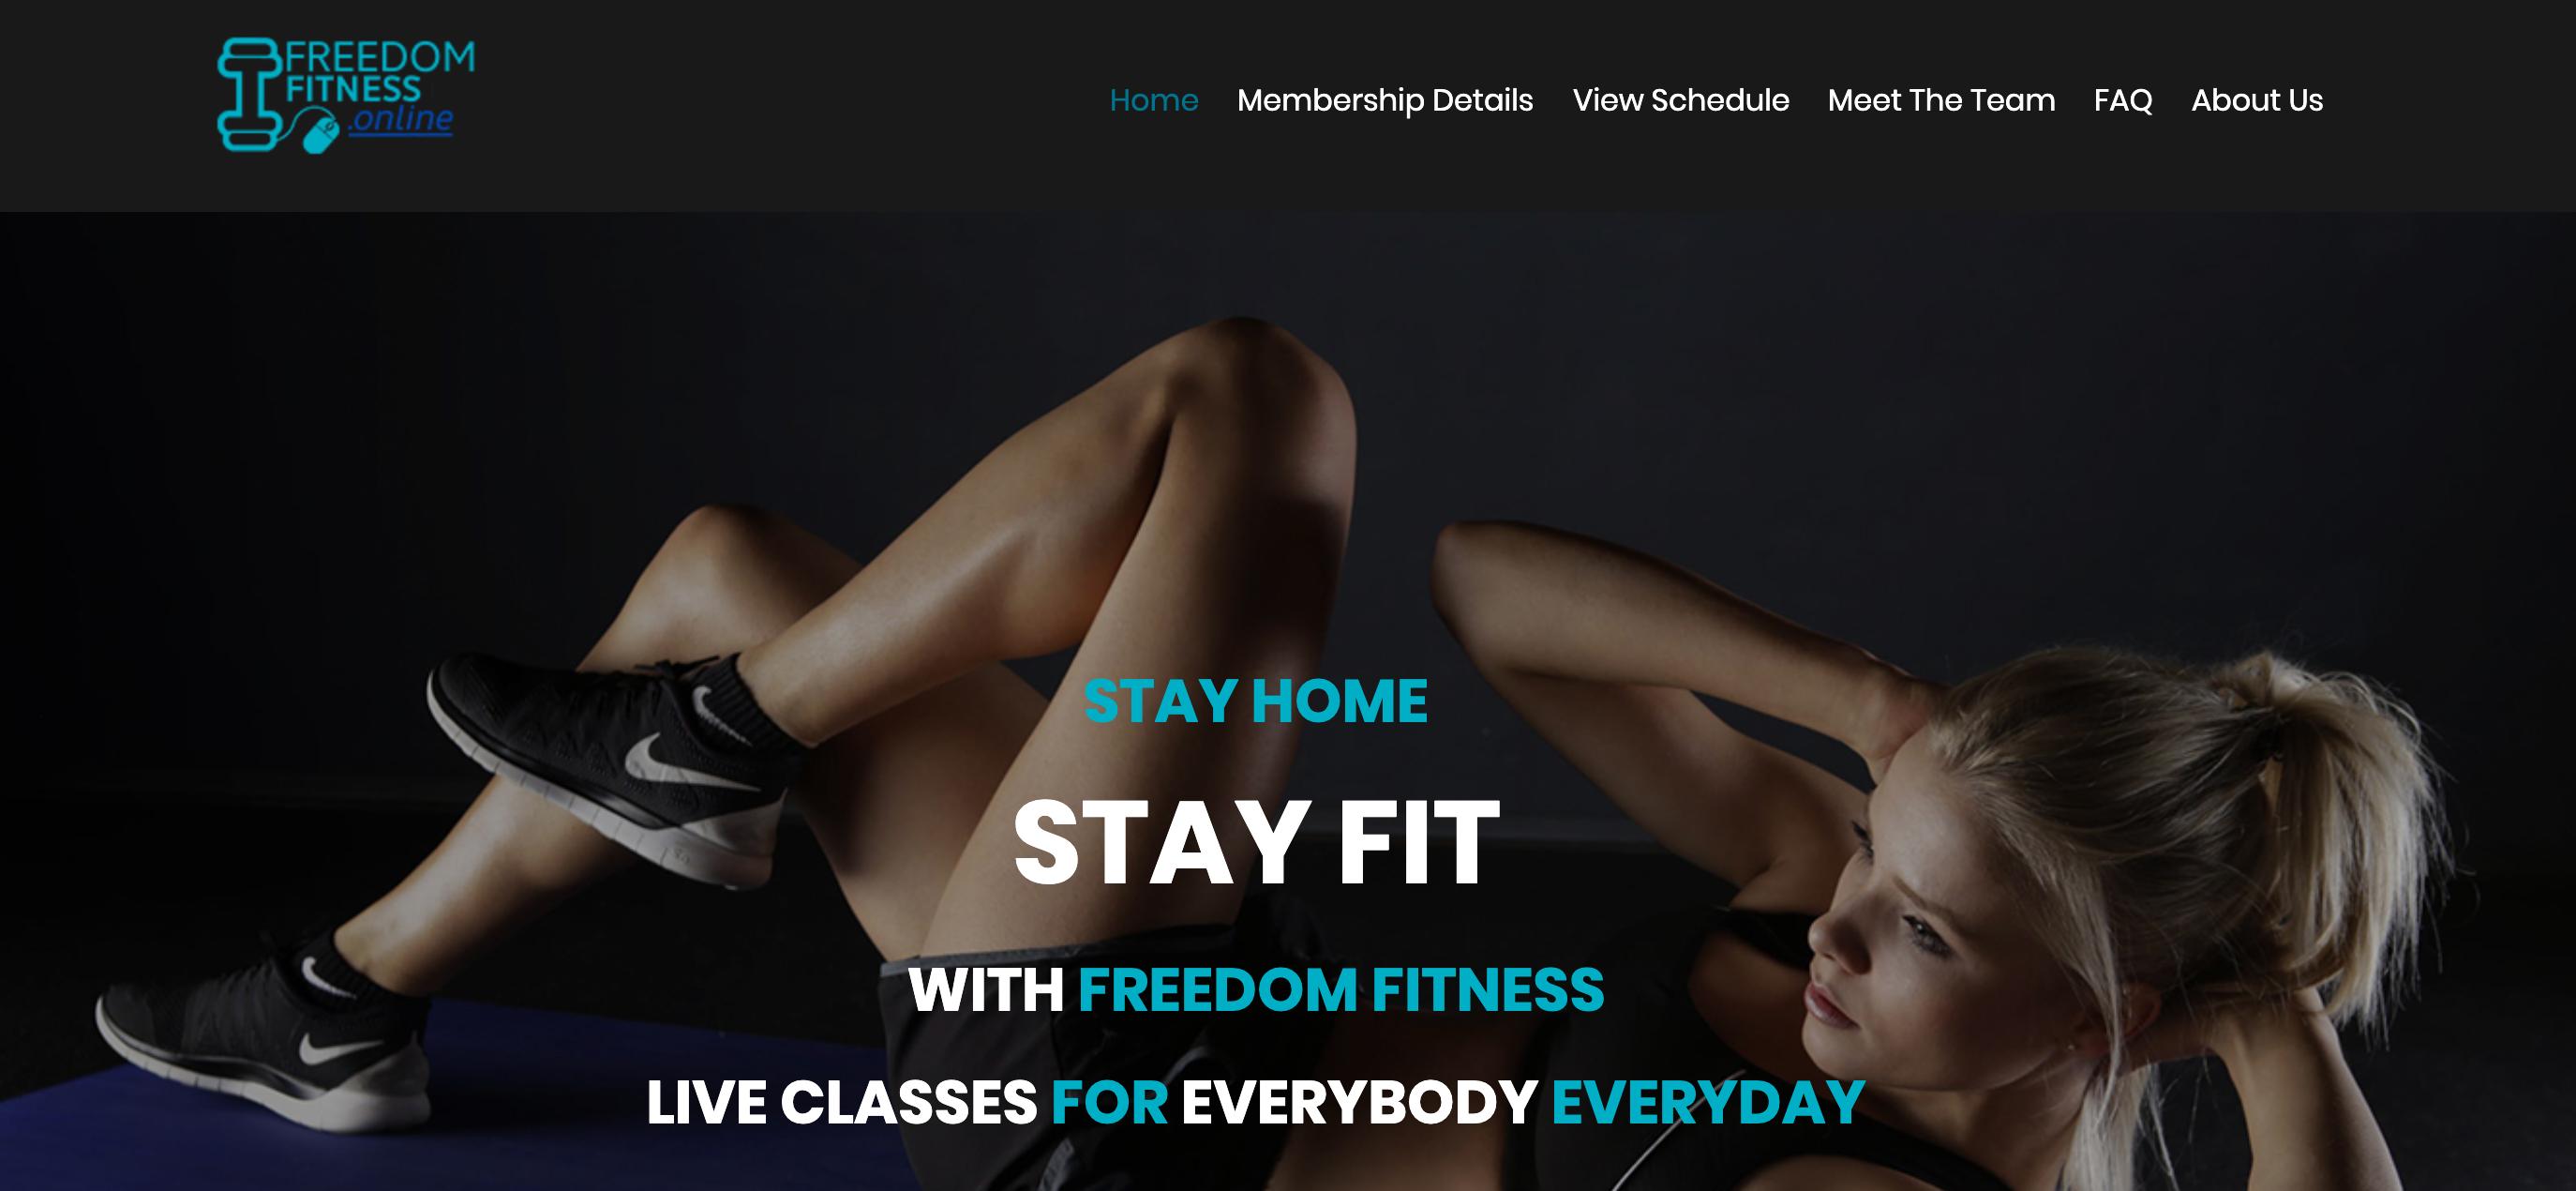 freedom fitness website